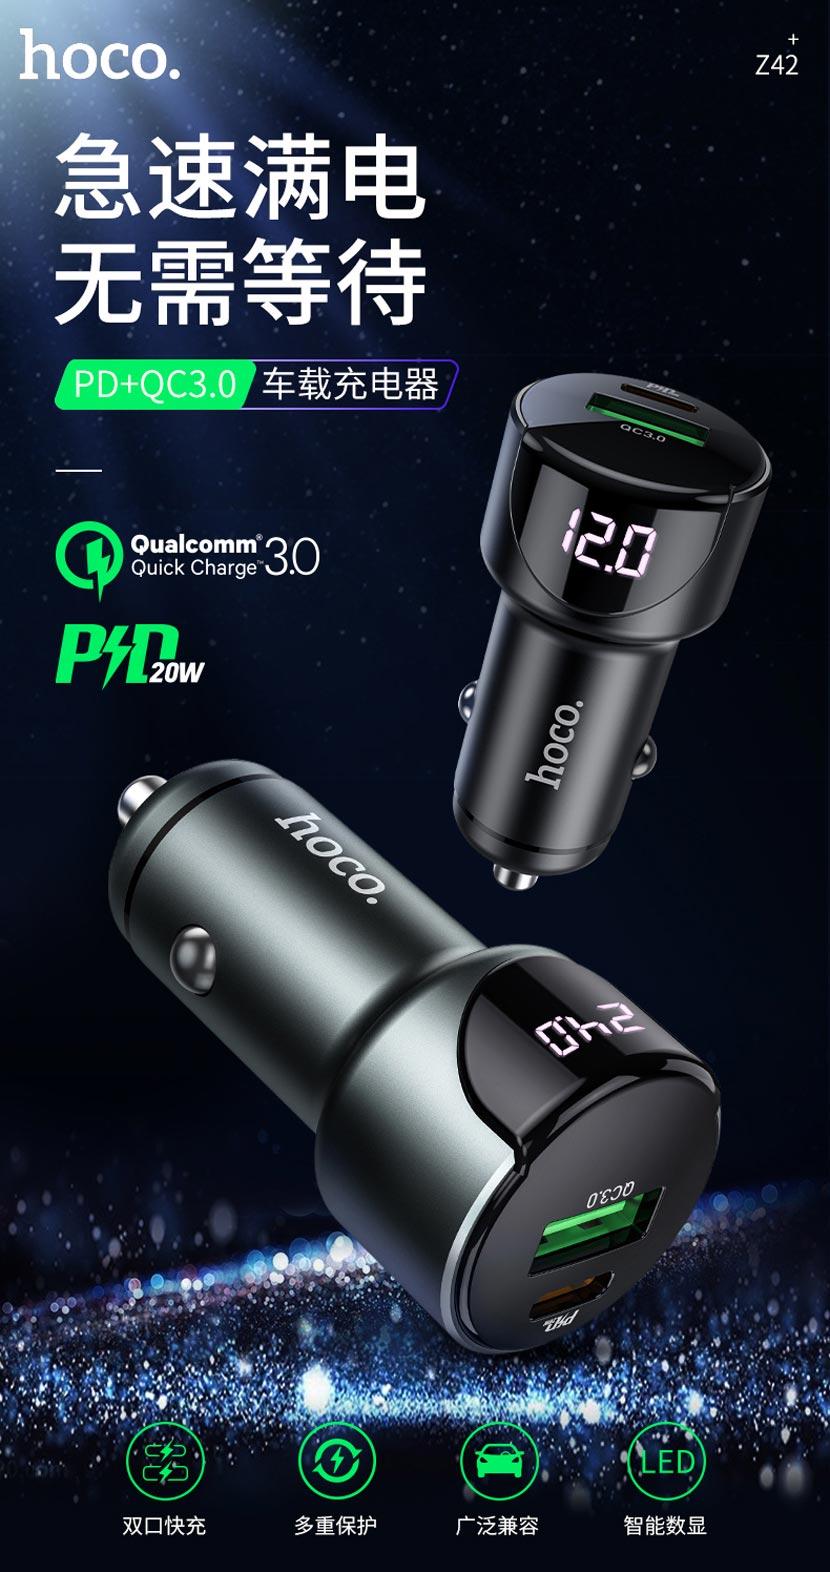 hoco news z42 light road dual port digital display pd20w qc3 car charger cn